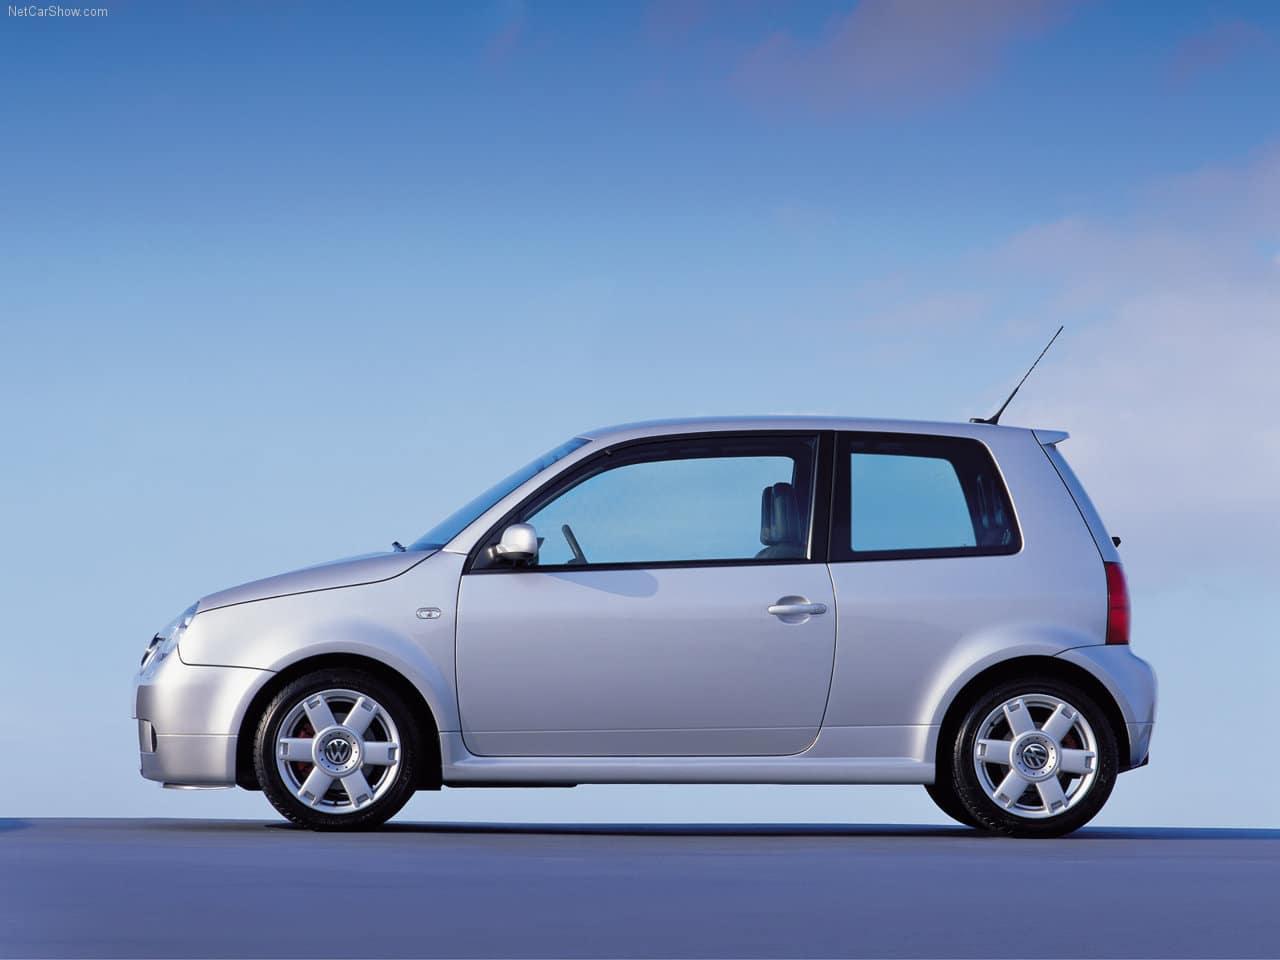 Volkswagen Lupo GTi, Volkswagen, Lupo, GTi, Lupo GTi, Volkswagen Golf GTi, Volkswagen Golf, Golf GTi, GTi, hot hatch, 16v, fun car, classic car, retro car, motoring, automotive, cars, car, VW, autotrader, ebay, ebay motors